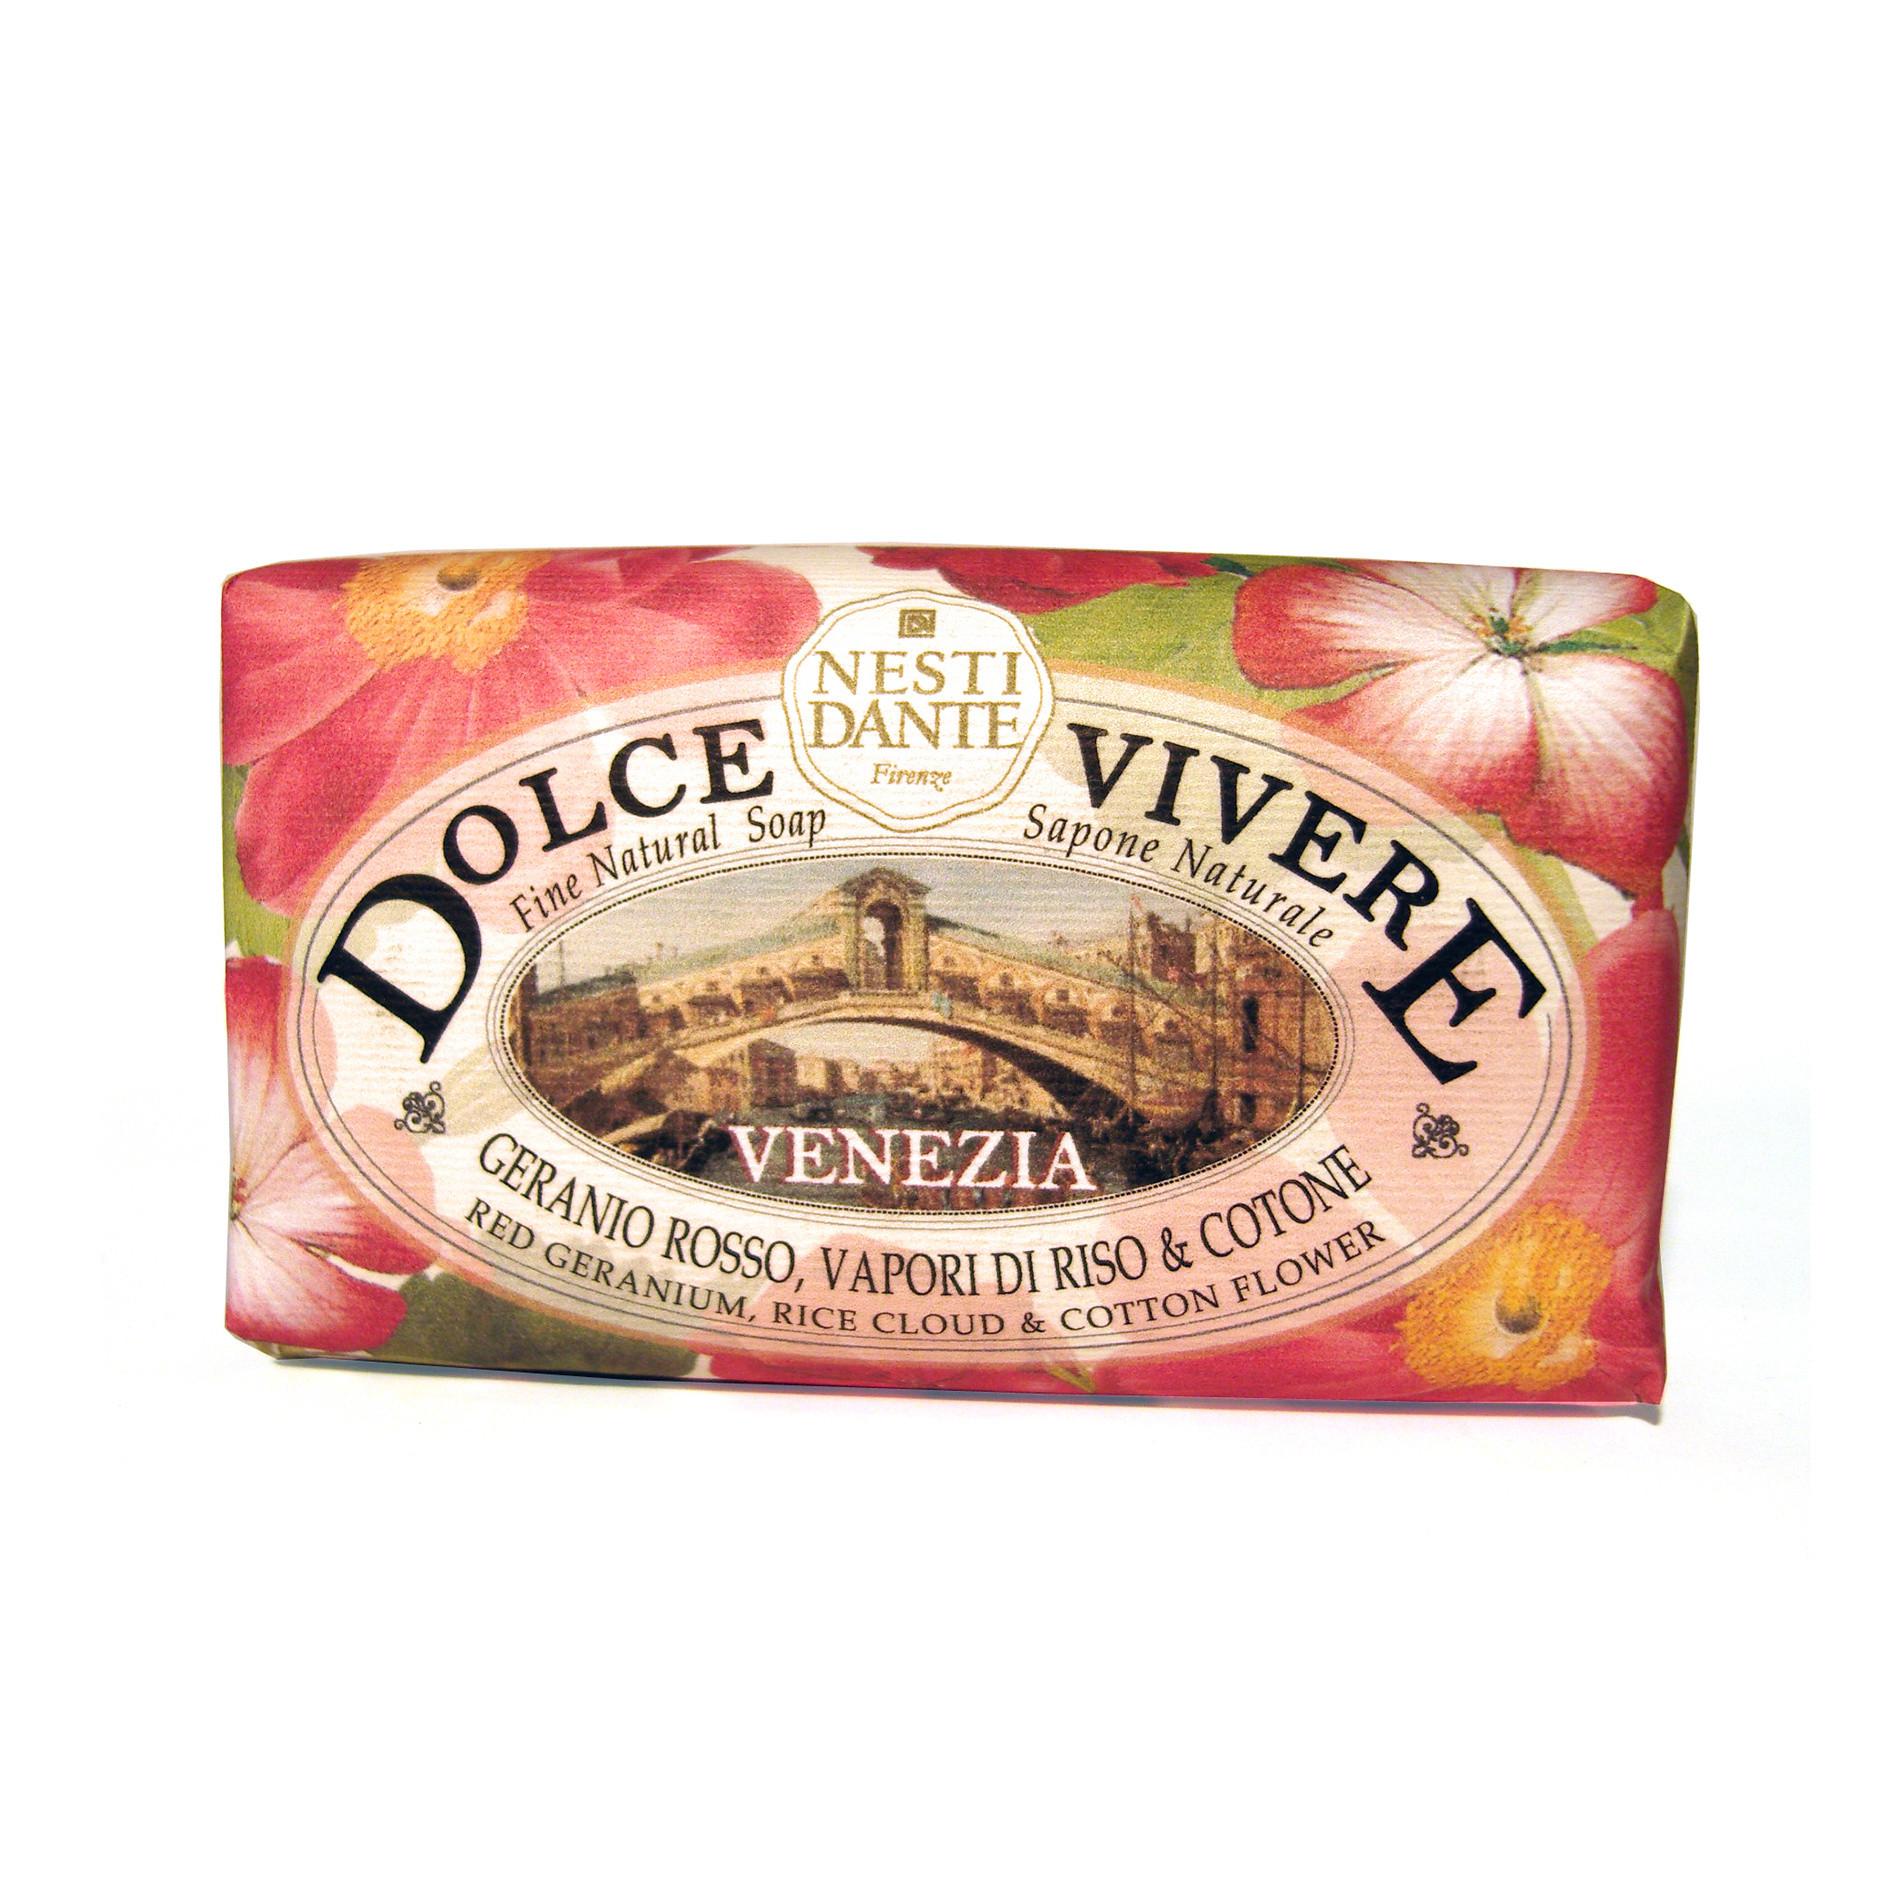 Dolce Vivere  - Venezia, Rosso, large image number 0